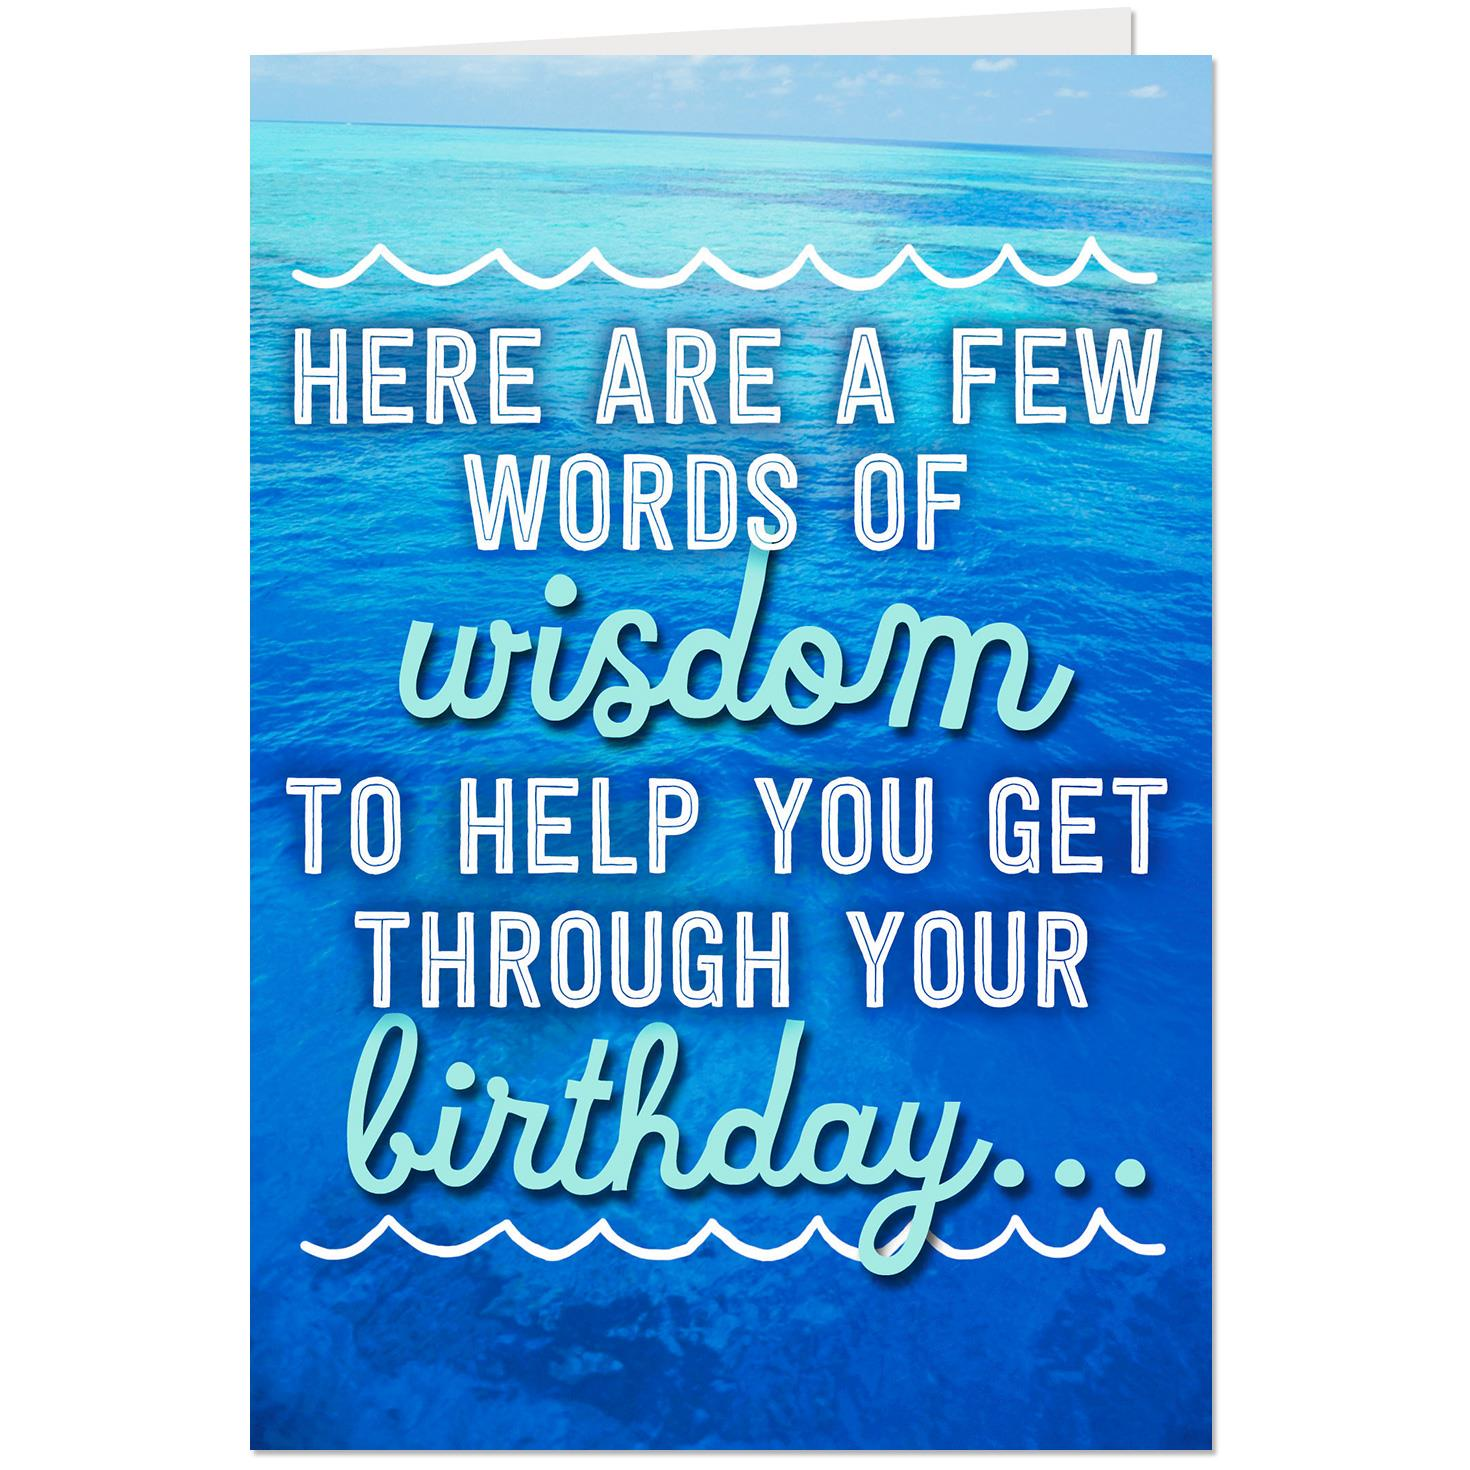 Wine Words of Wisdom Funny Pop Up Birthday Card - Greeting ...